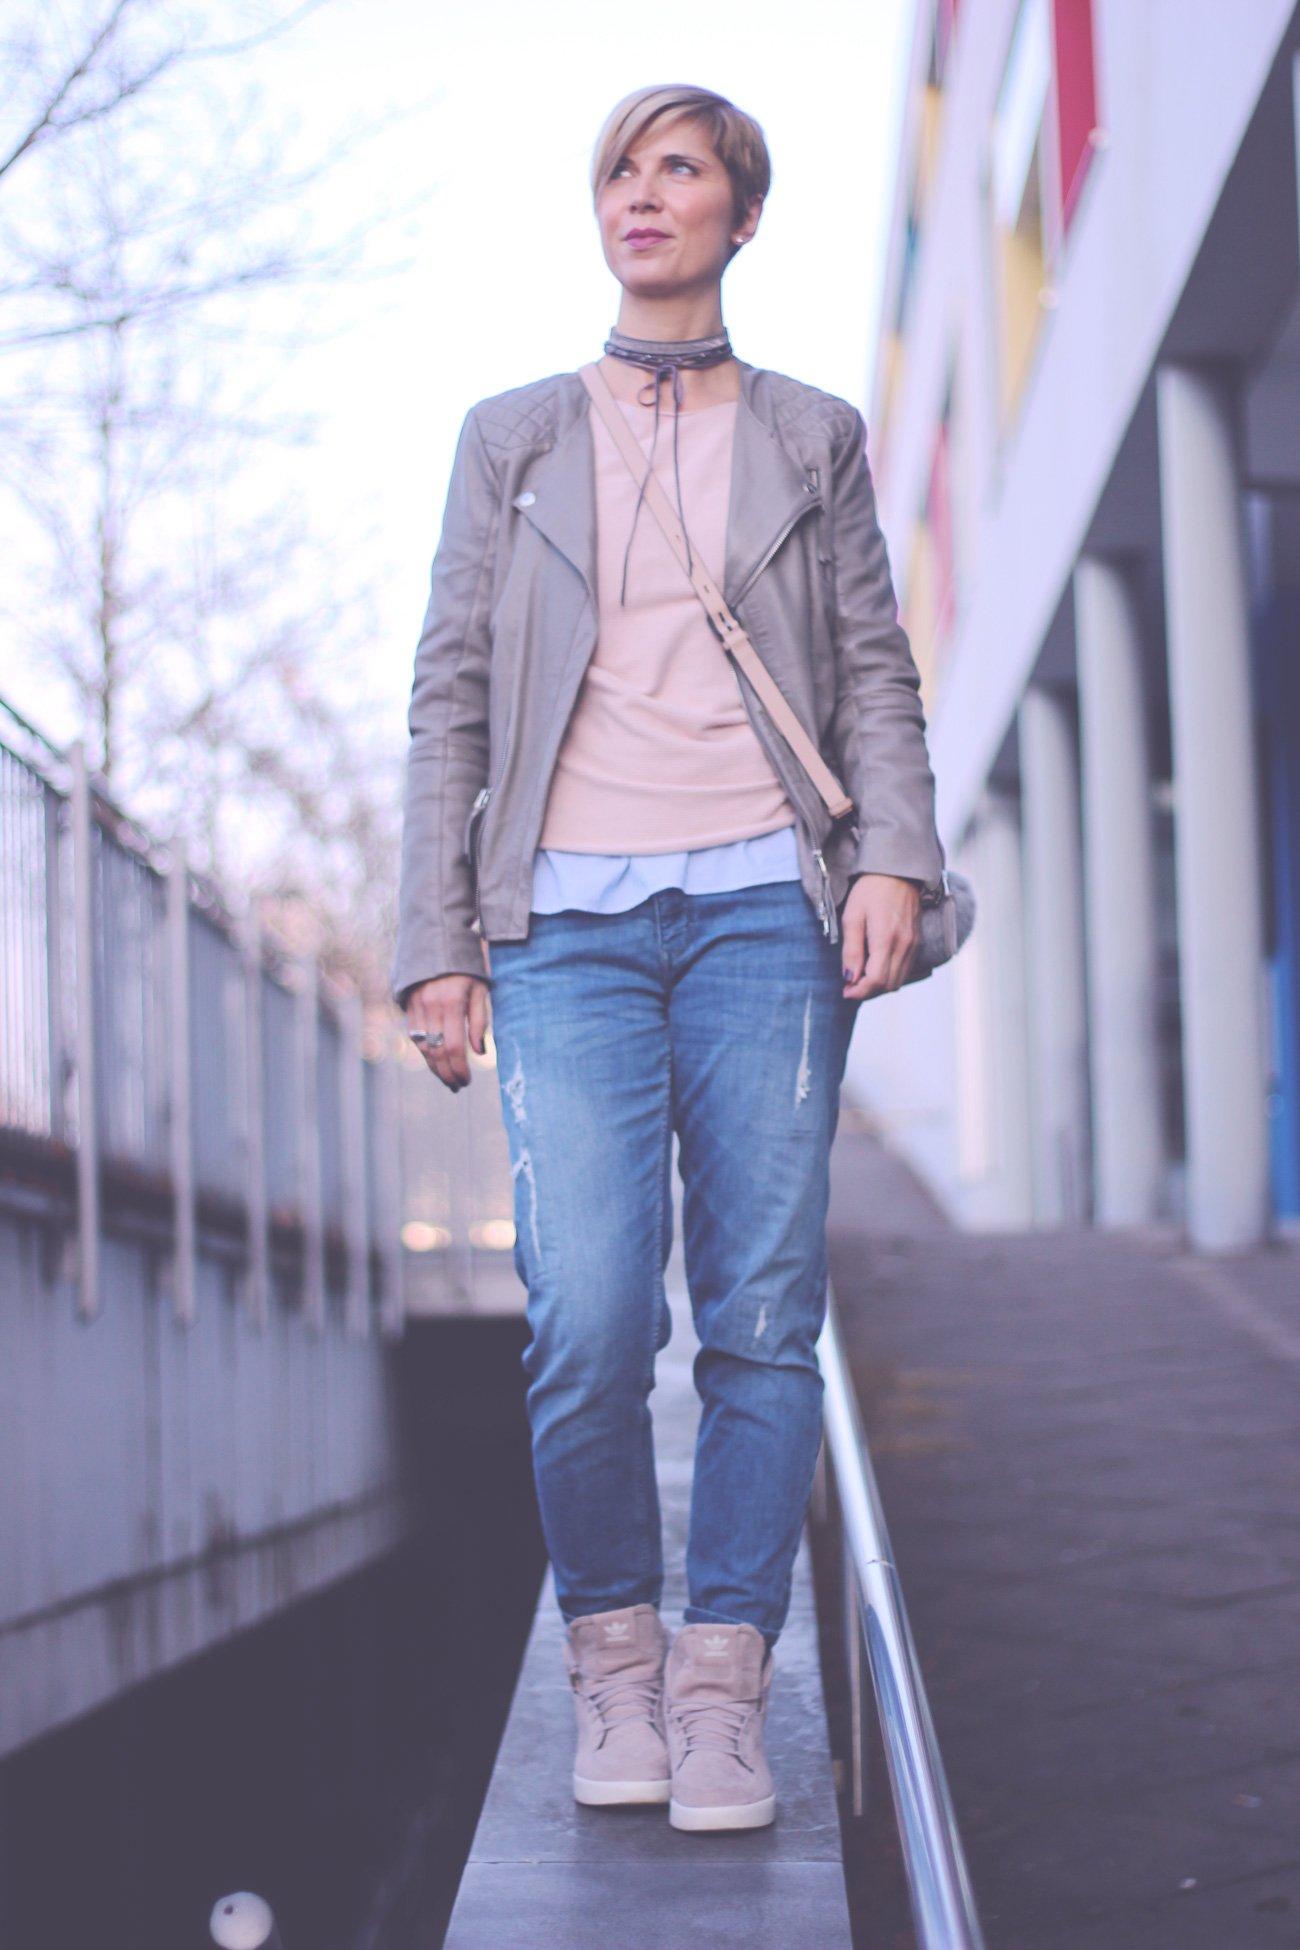 rose-quartz, serenity, Trompetenärmel, Conny Doll, Münchenblog, Outfitblogger, Boyfriendstyle, casual, Sneaker, Adidas, Zara, soyaconcept, Lederjacke